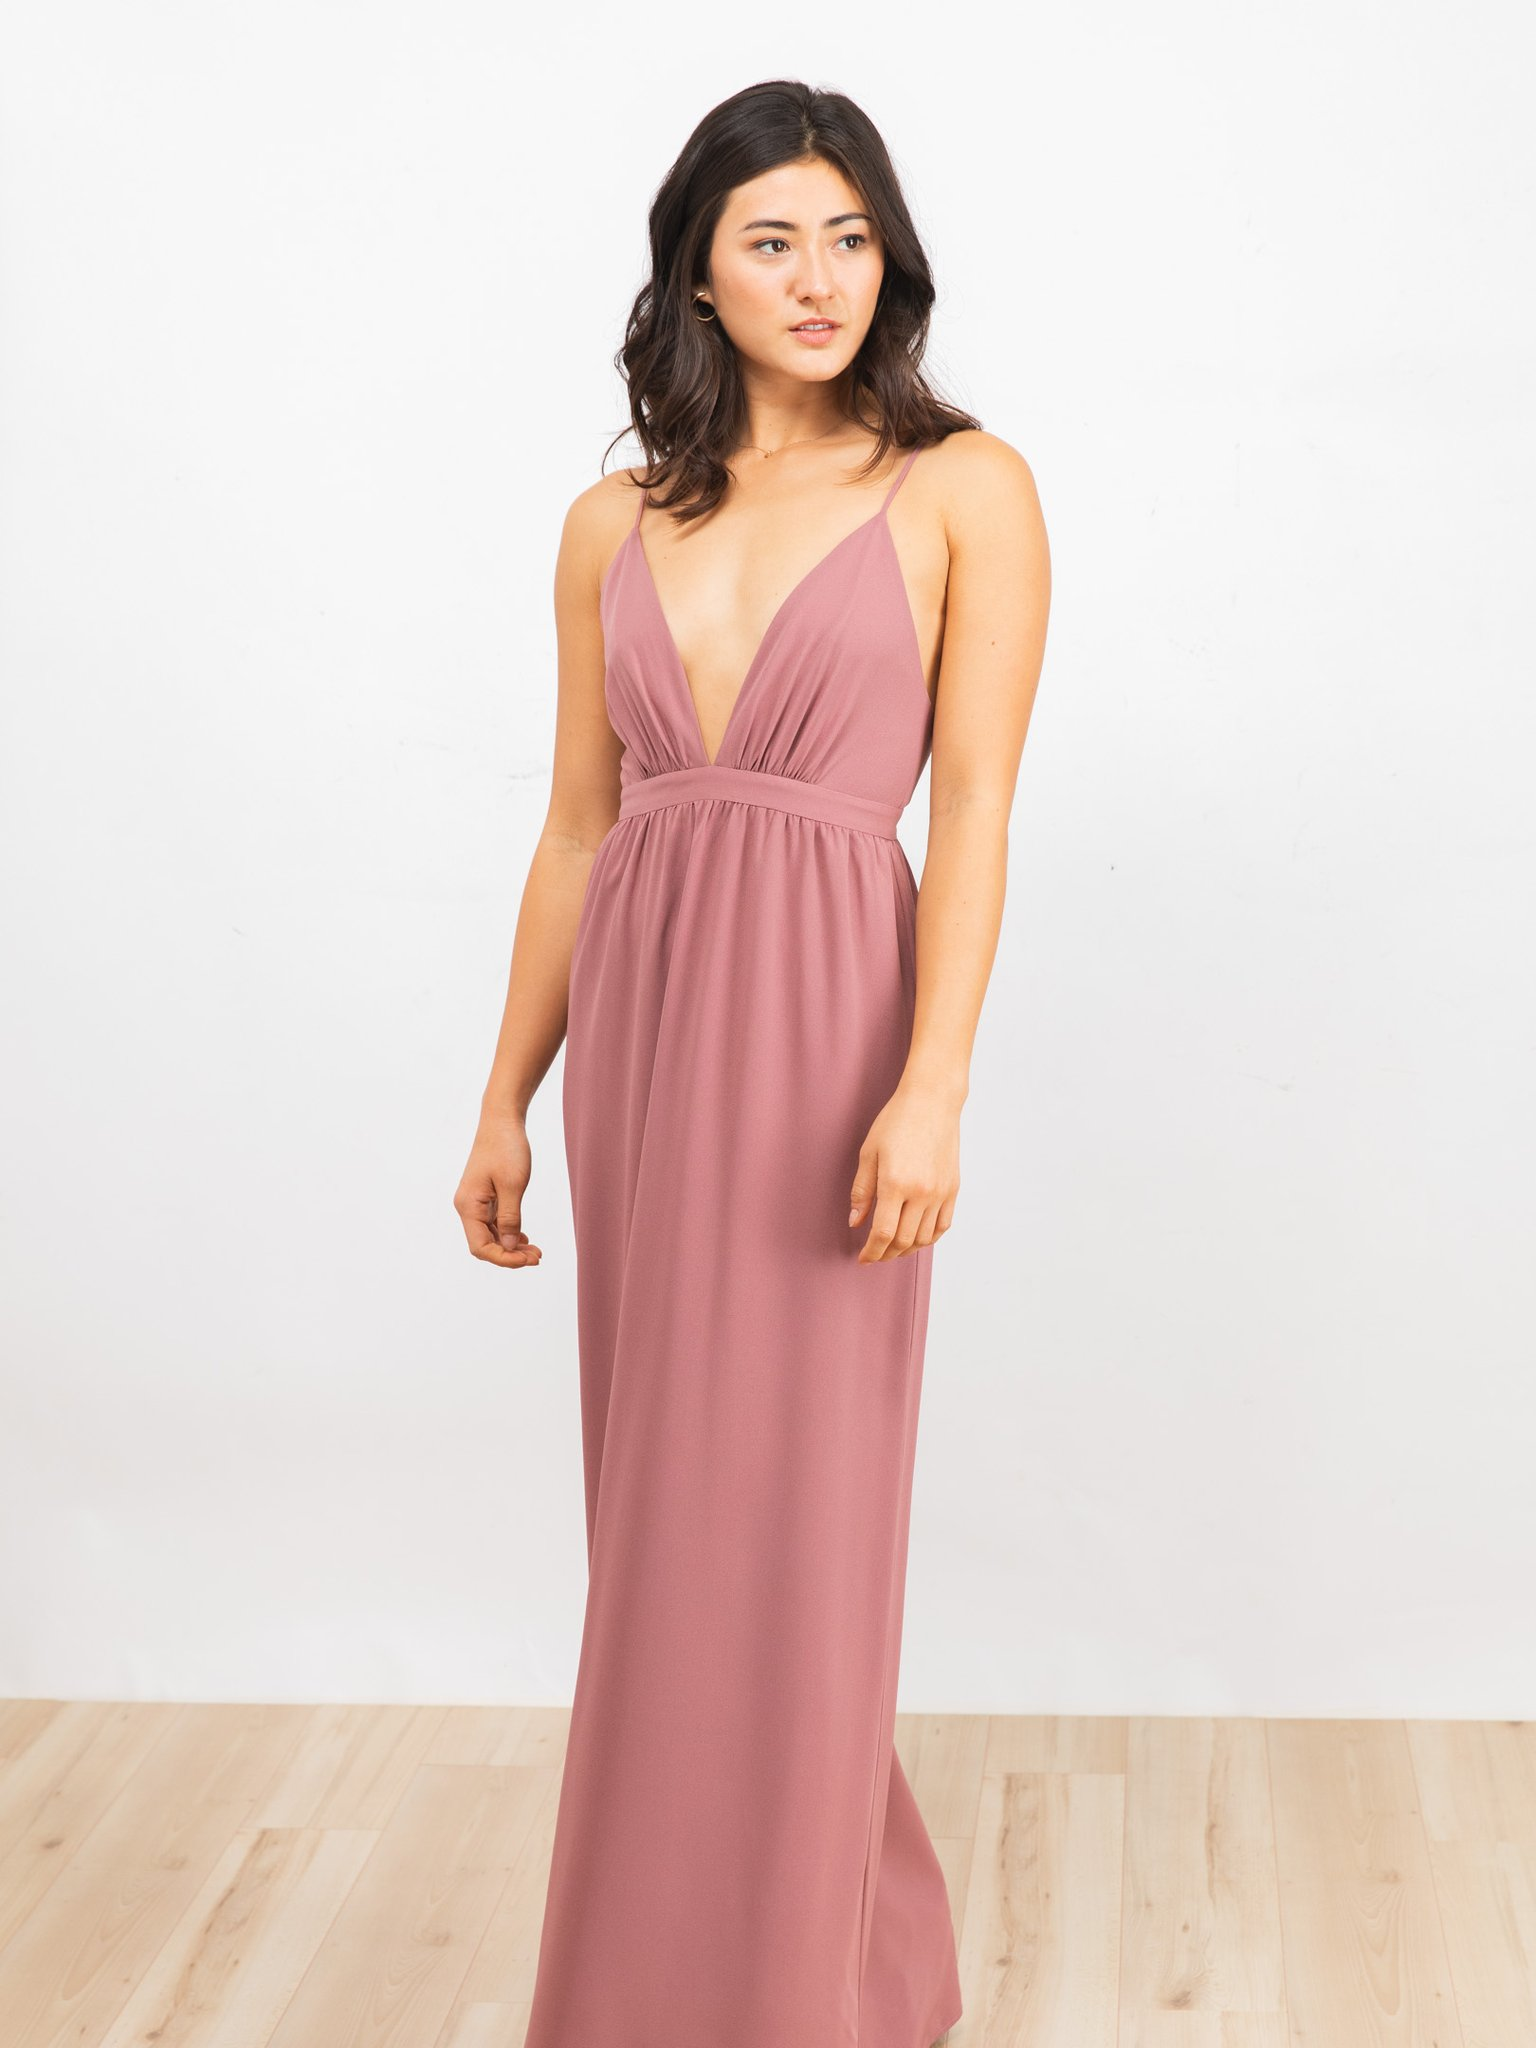 1004_-_Trinity_Dress_-_181021-PF_Ecomm-156_1024x1024@2x.jpg